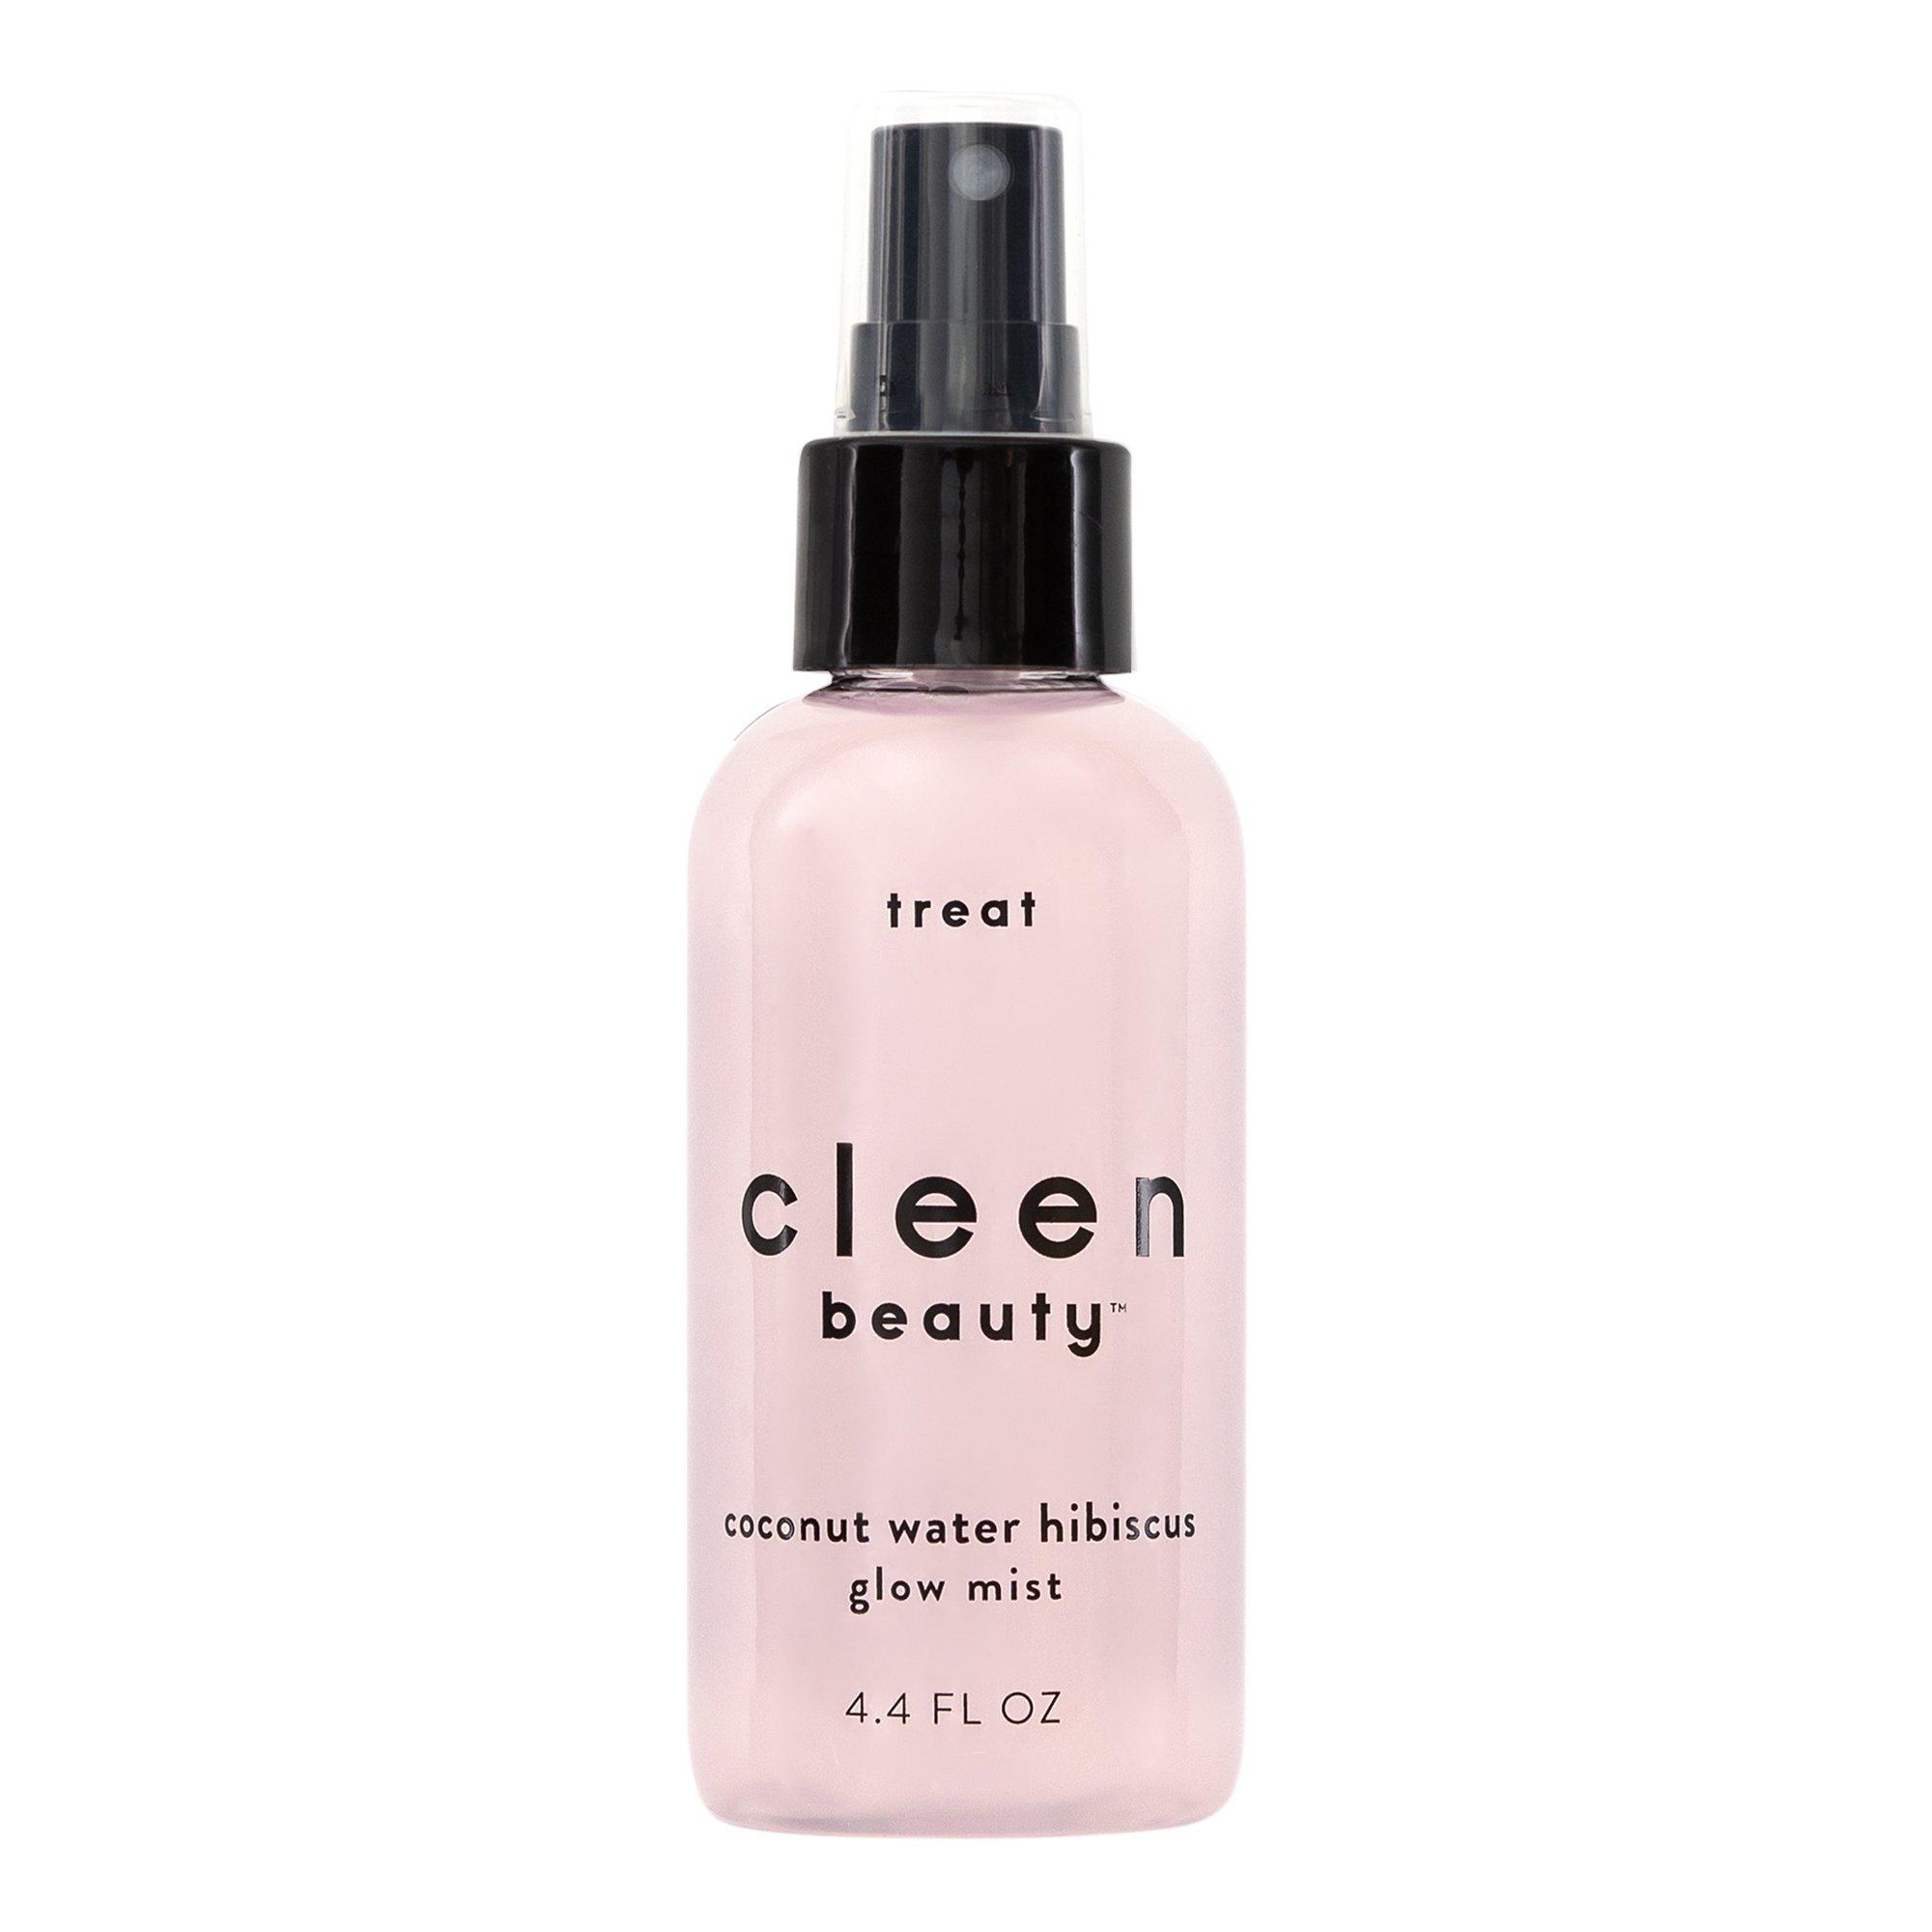 cleen beauty Glow Mist With Coconut Water & Hibiscus